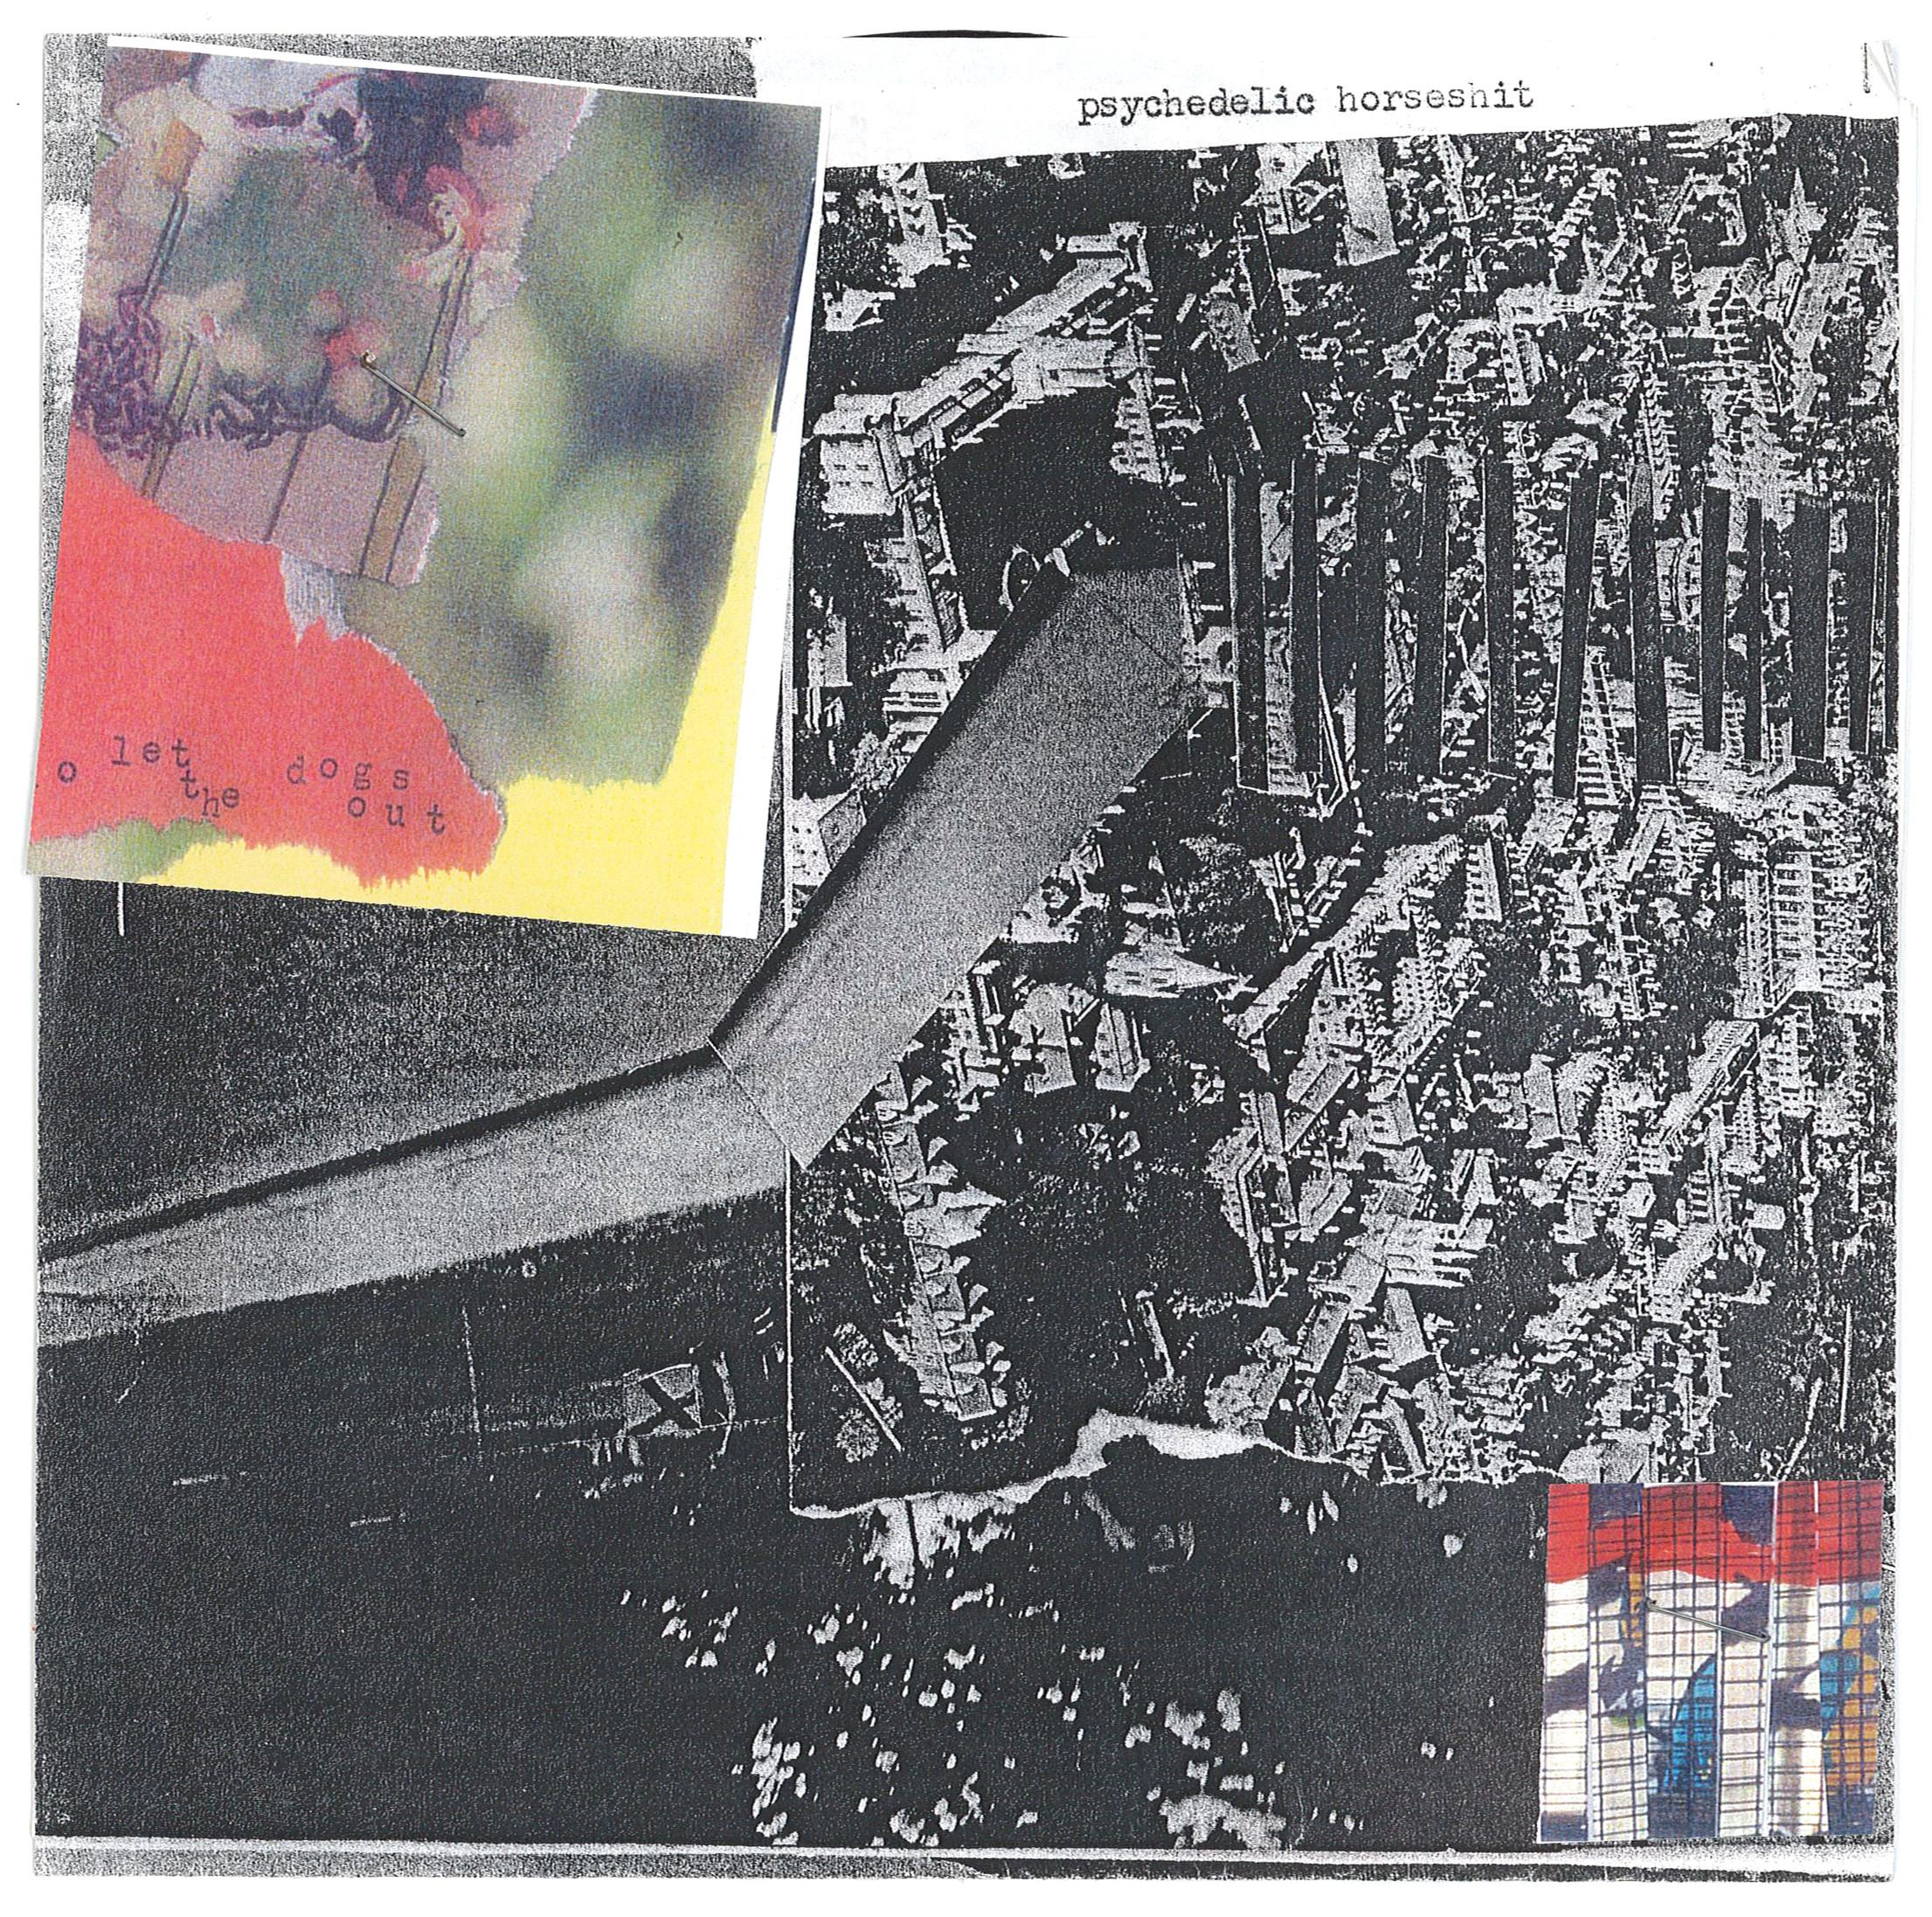 WLWLTDOO-2006-7-PSYCH_HORSE-WLTDO-FRONT.jpg